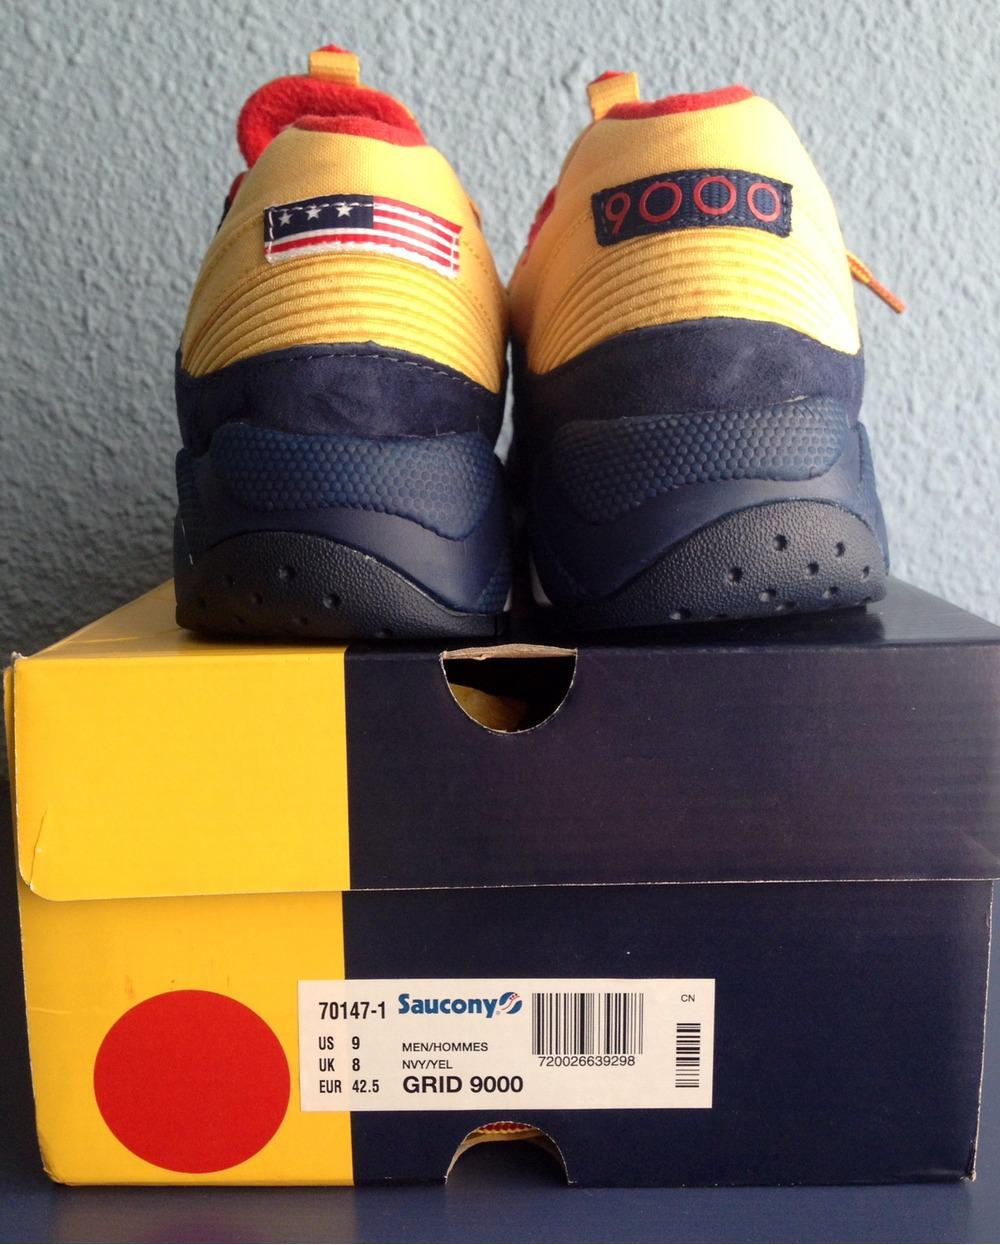 BUY Packer Shoes X Saucony Grid 9000 Snow Beach | Kixify